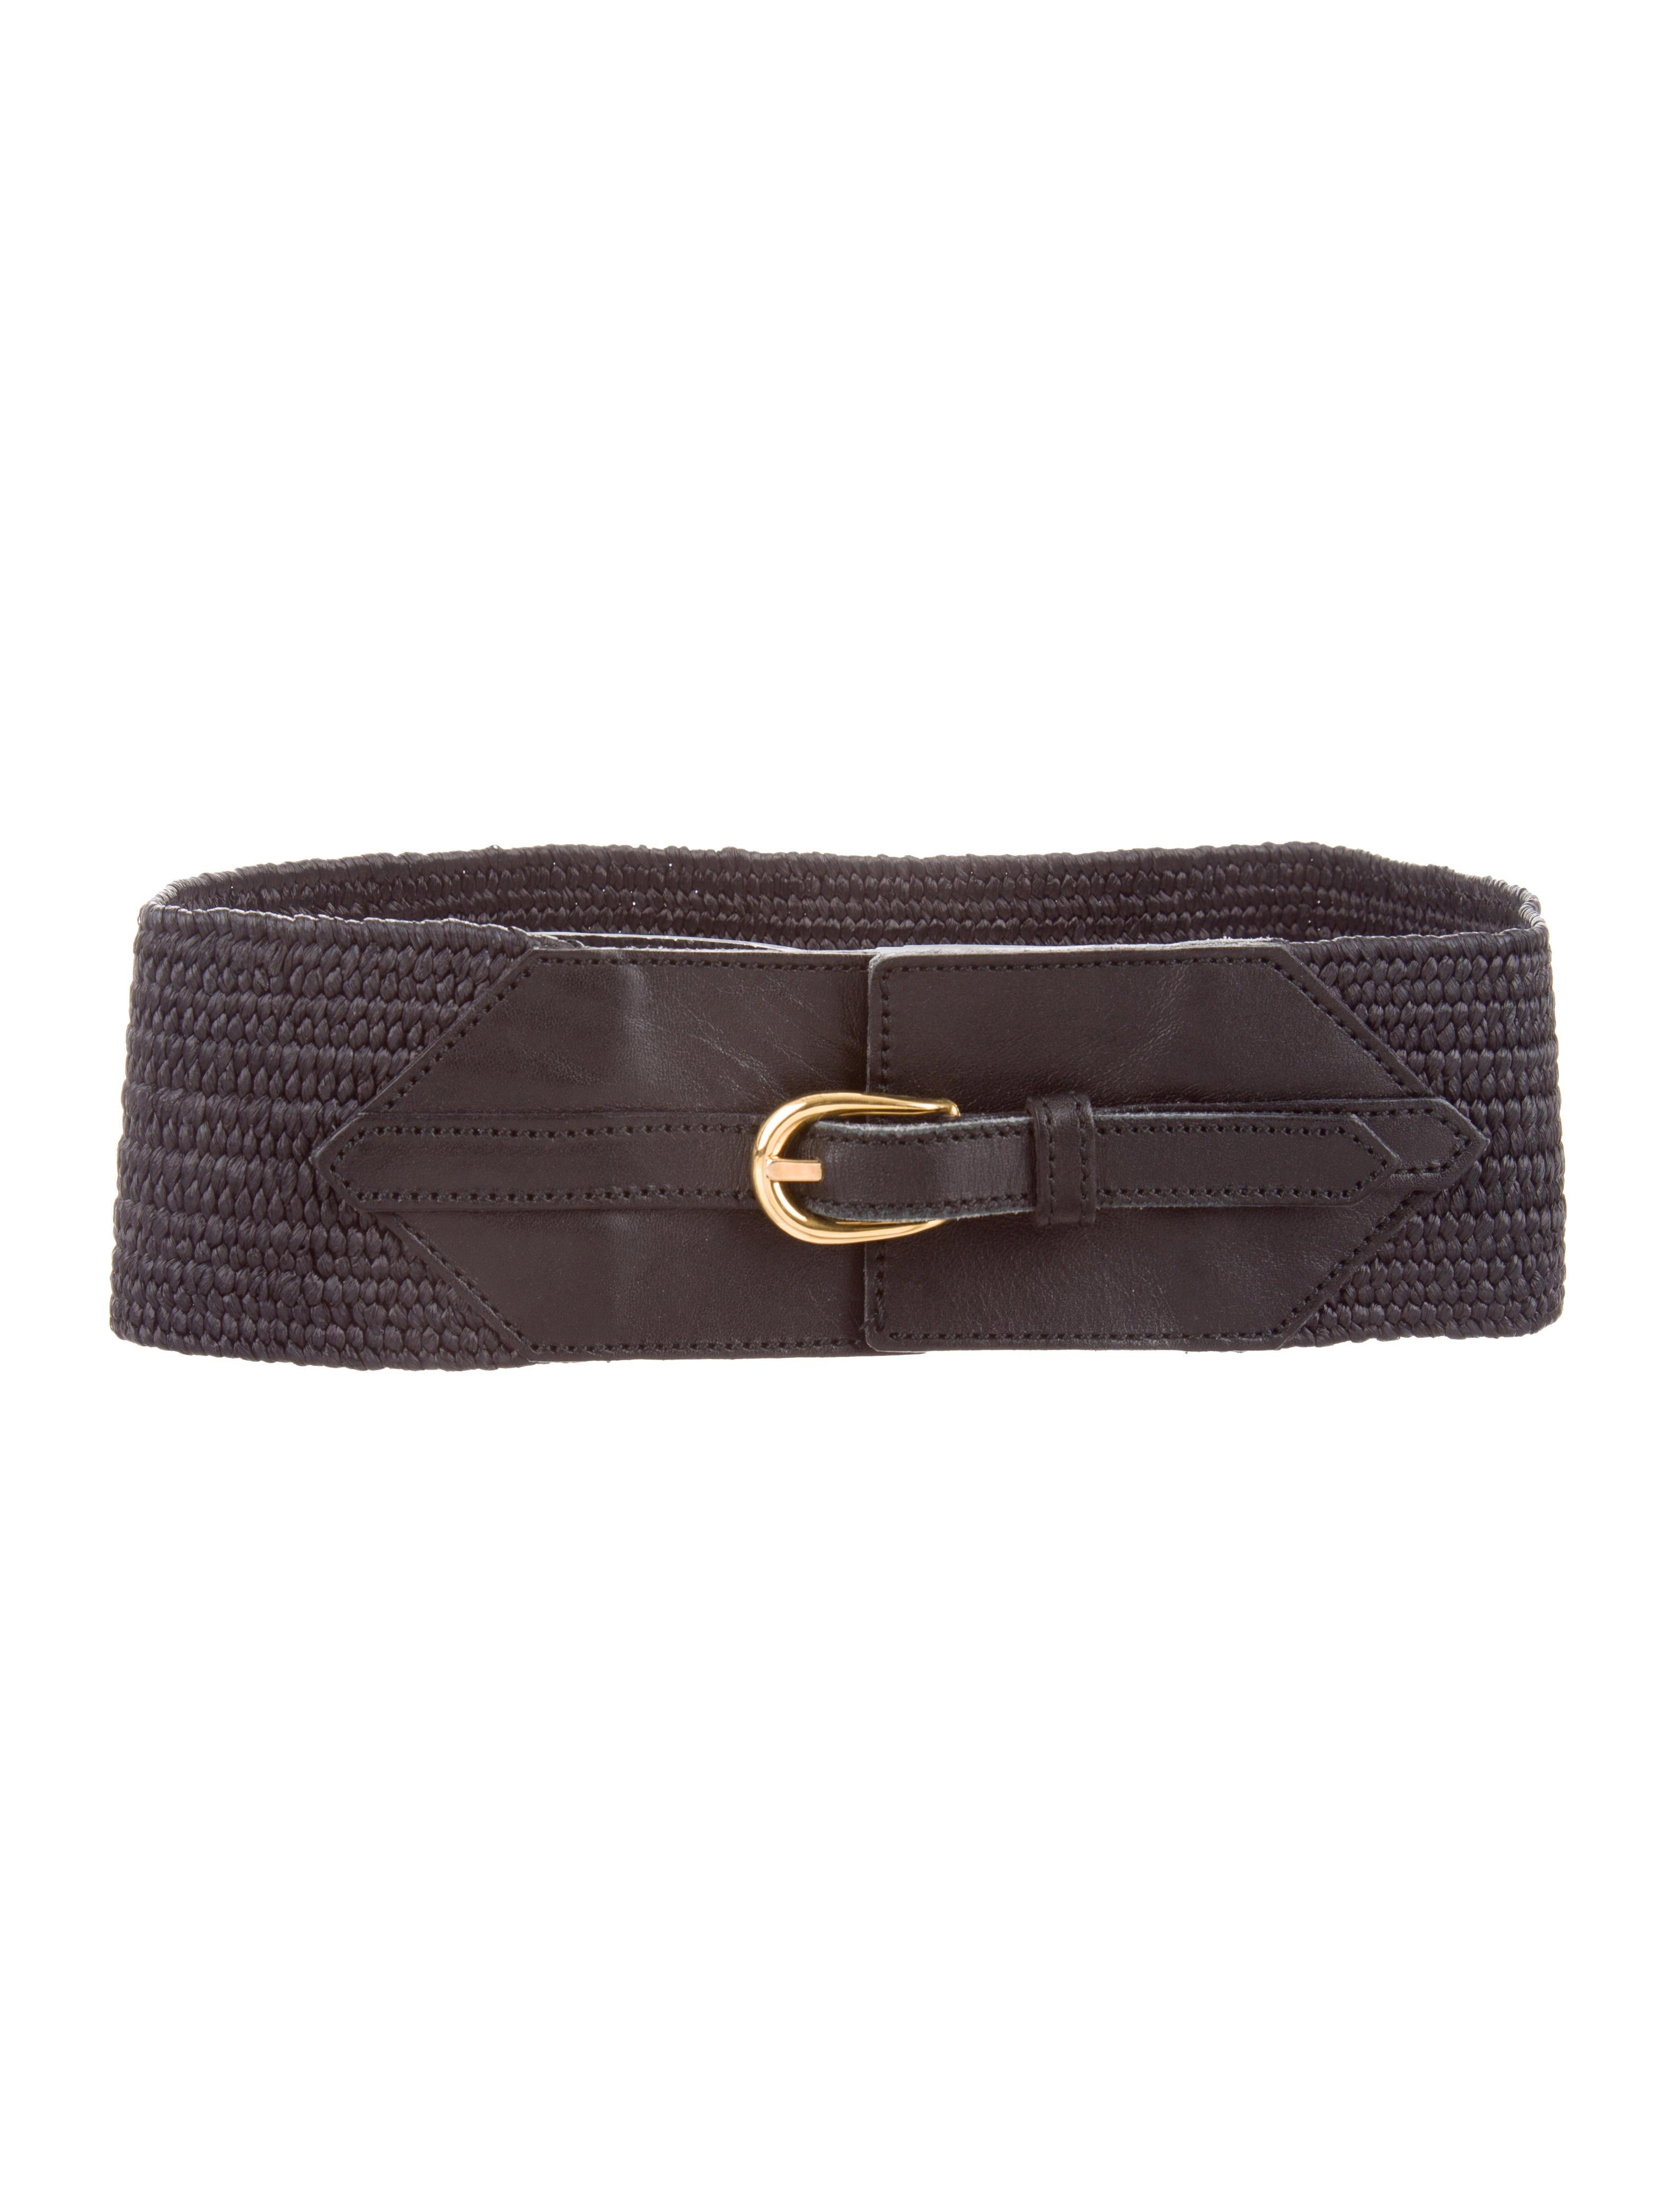 907b007d863e Yves Saint Laurent Elastic Buckle Belt - Accessories - YVE89407 ...